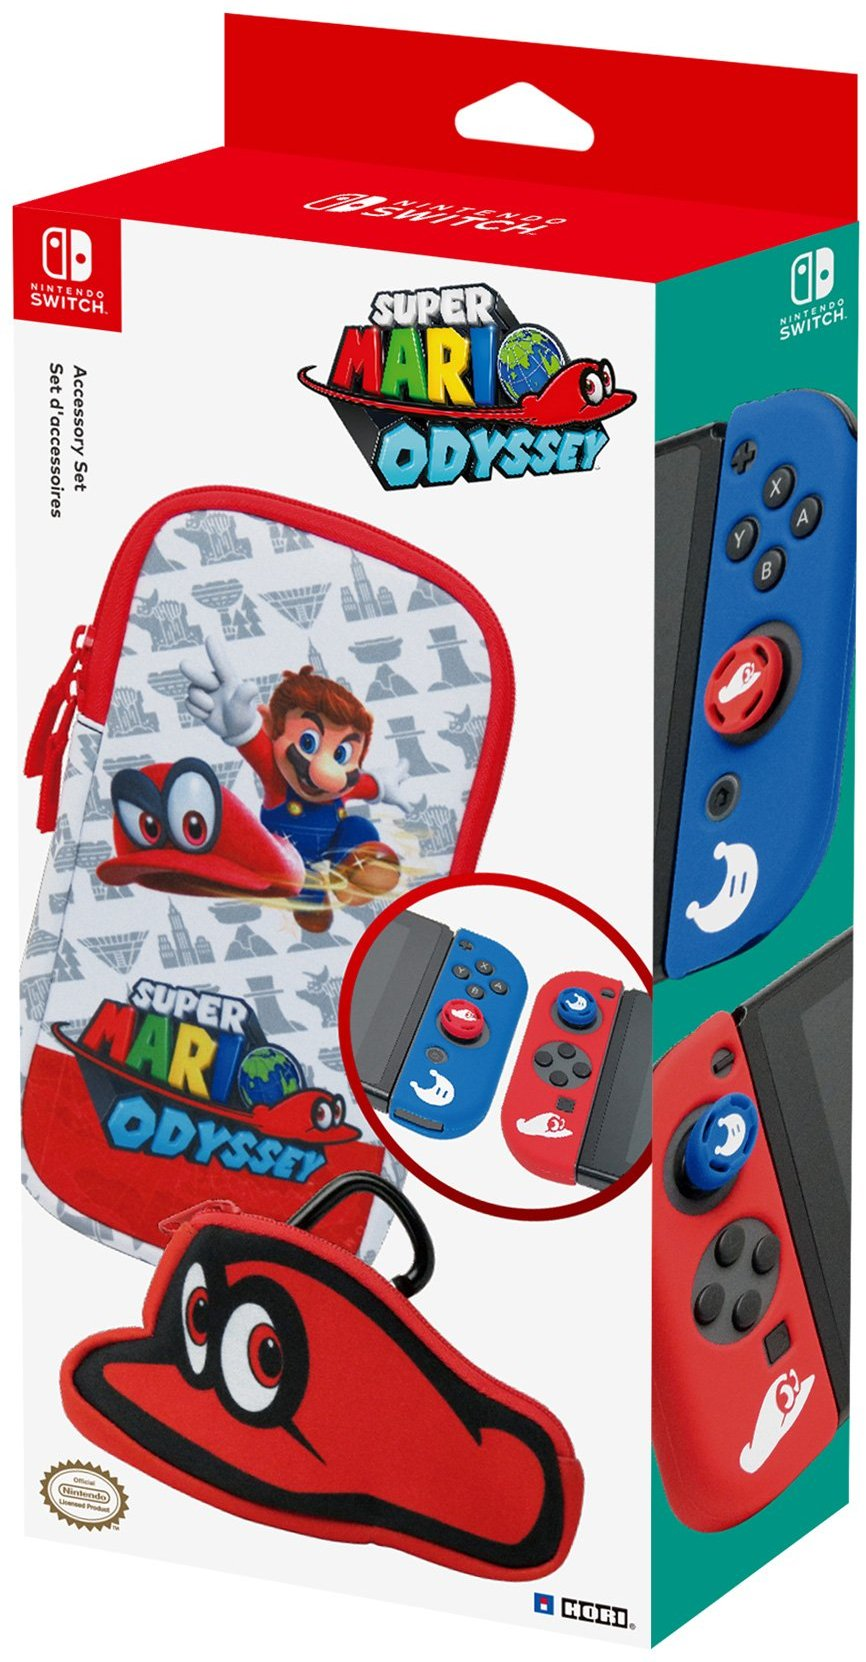 HORI Preparing A Super Mario Odyssey Accessory Set For